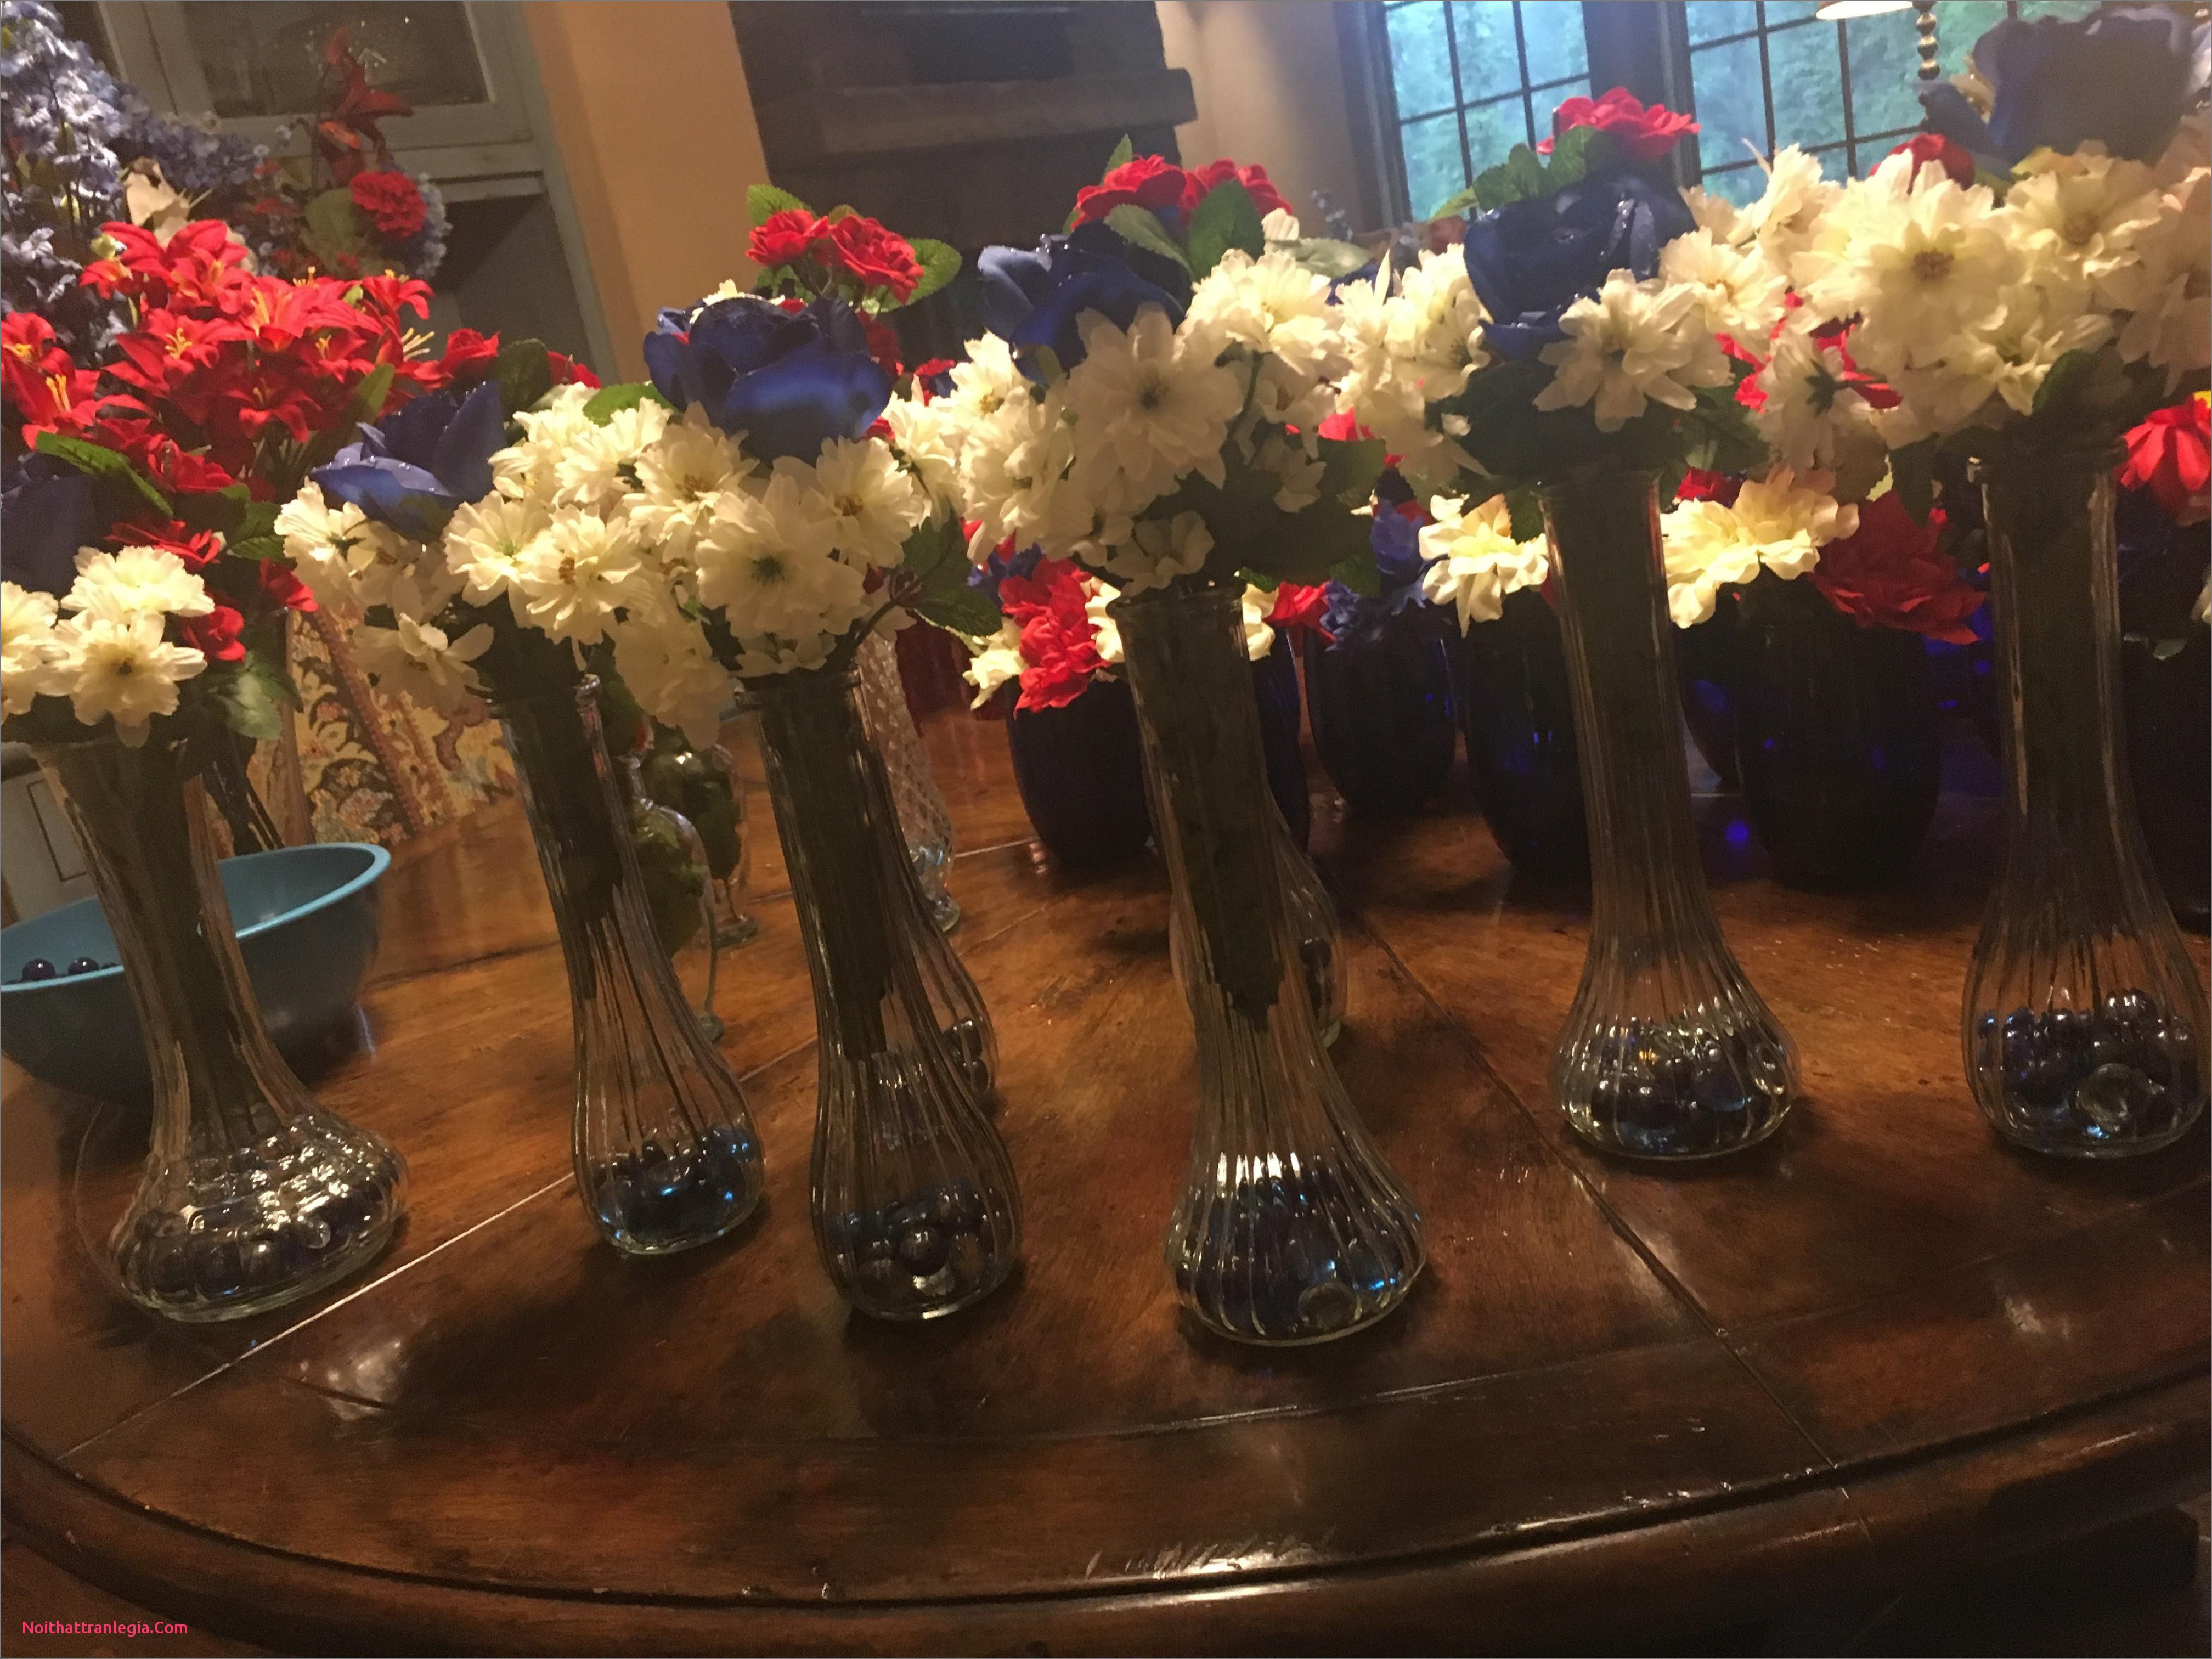 a flower vase of 20 how to clean flower vases noithattranlegia vases design intended for diy wedding decoration ideas inspirational dollar tree wedding decorations awesome h vases dollar vase i 0d